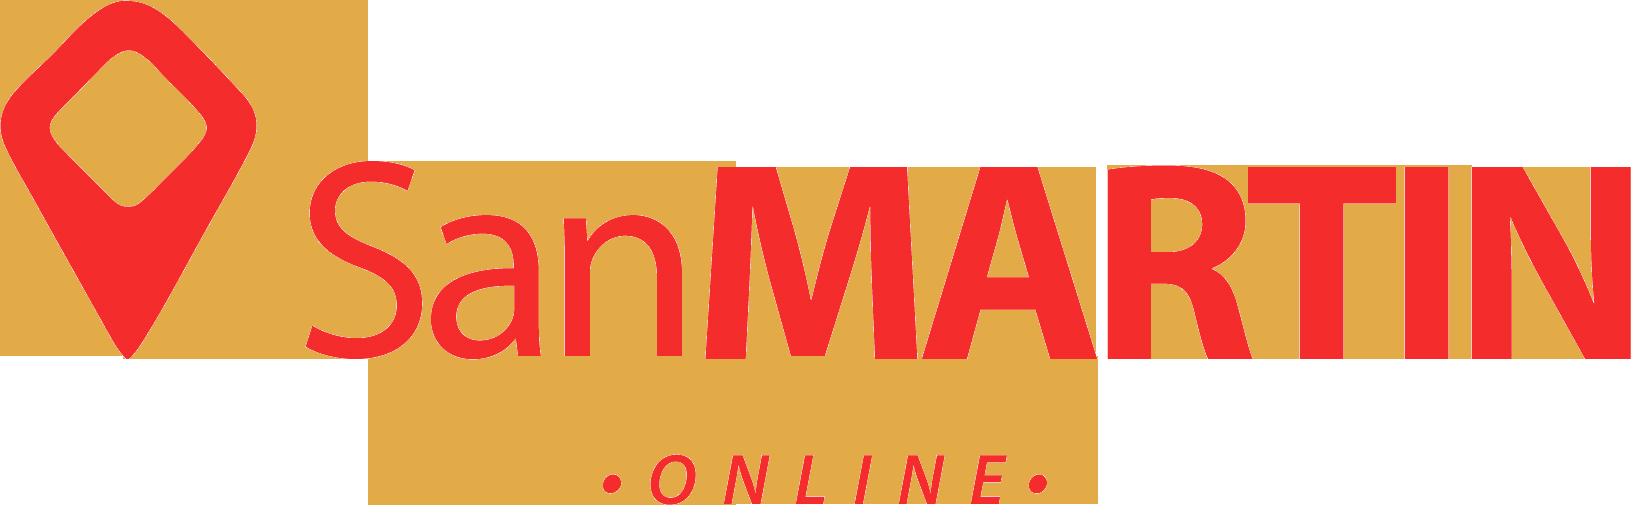 San Martín Online